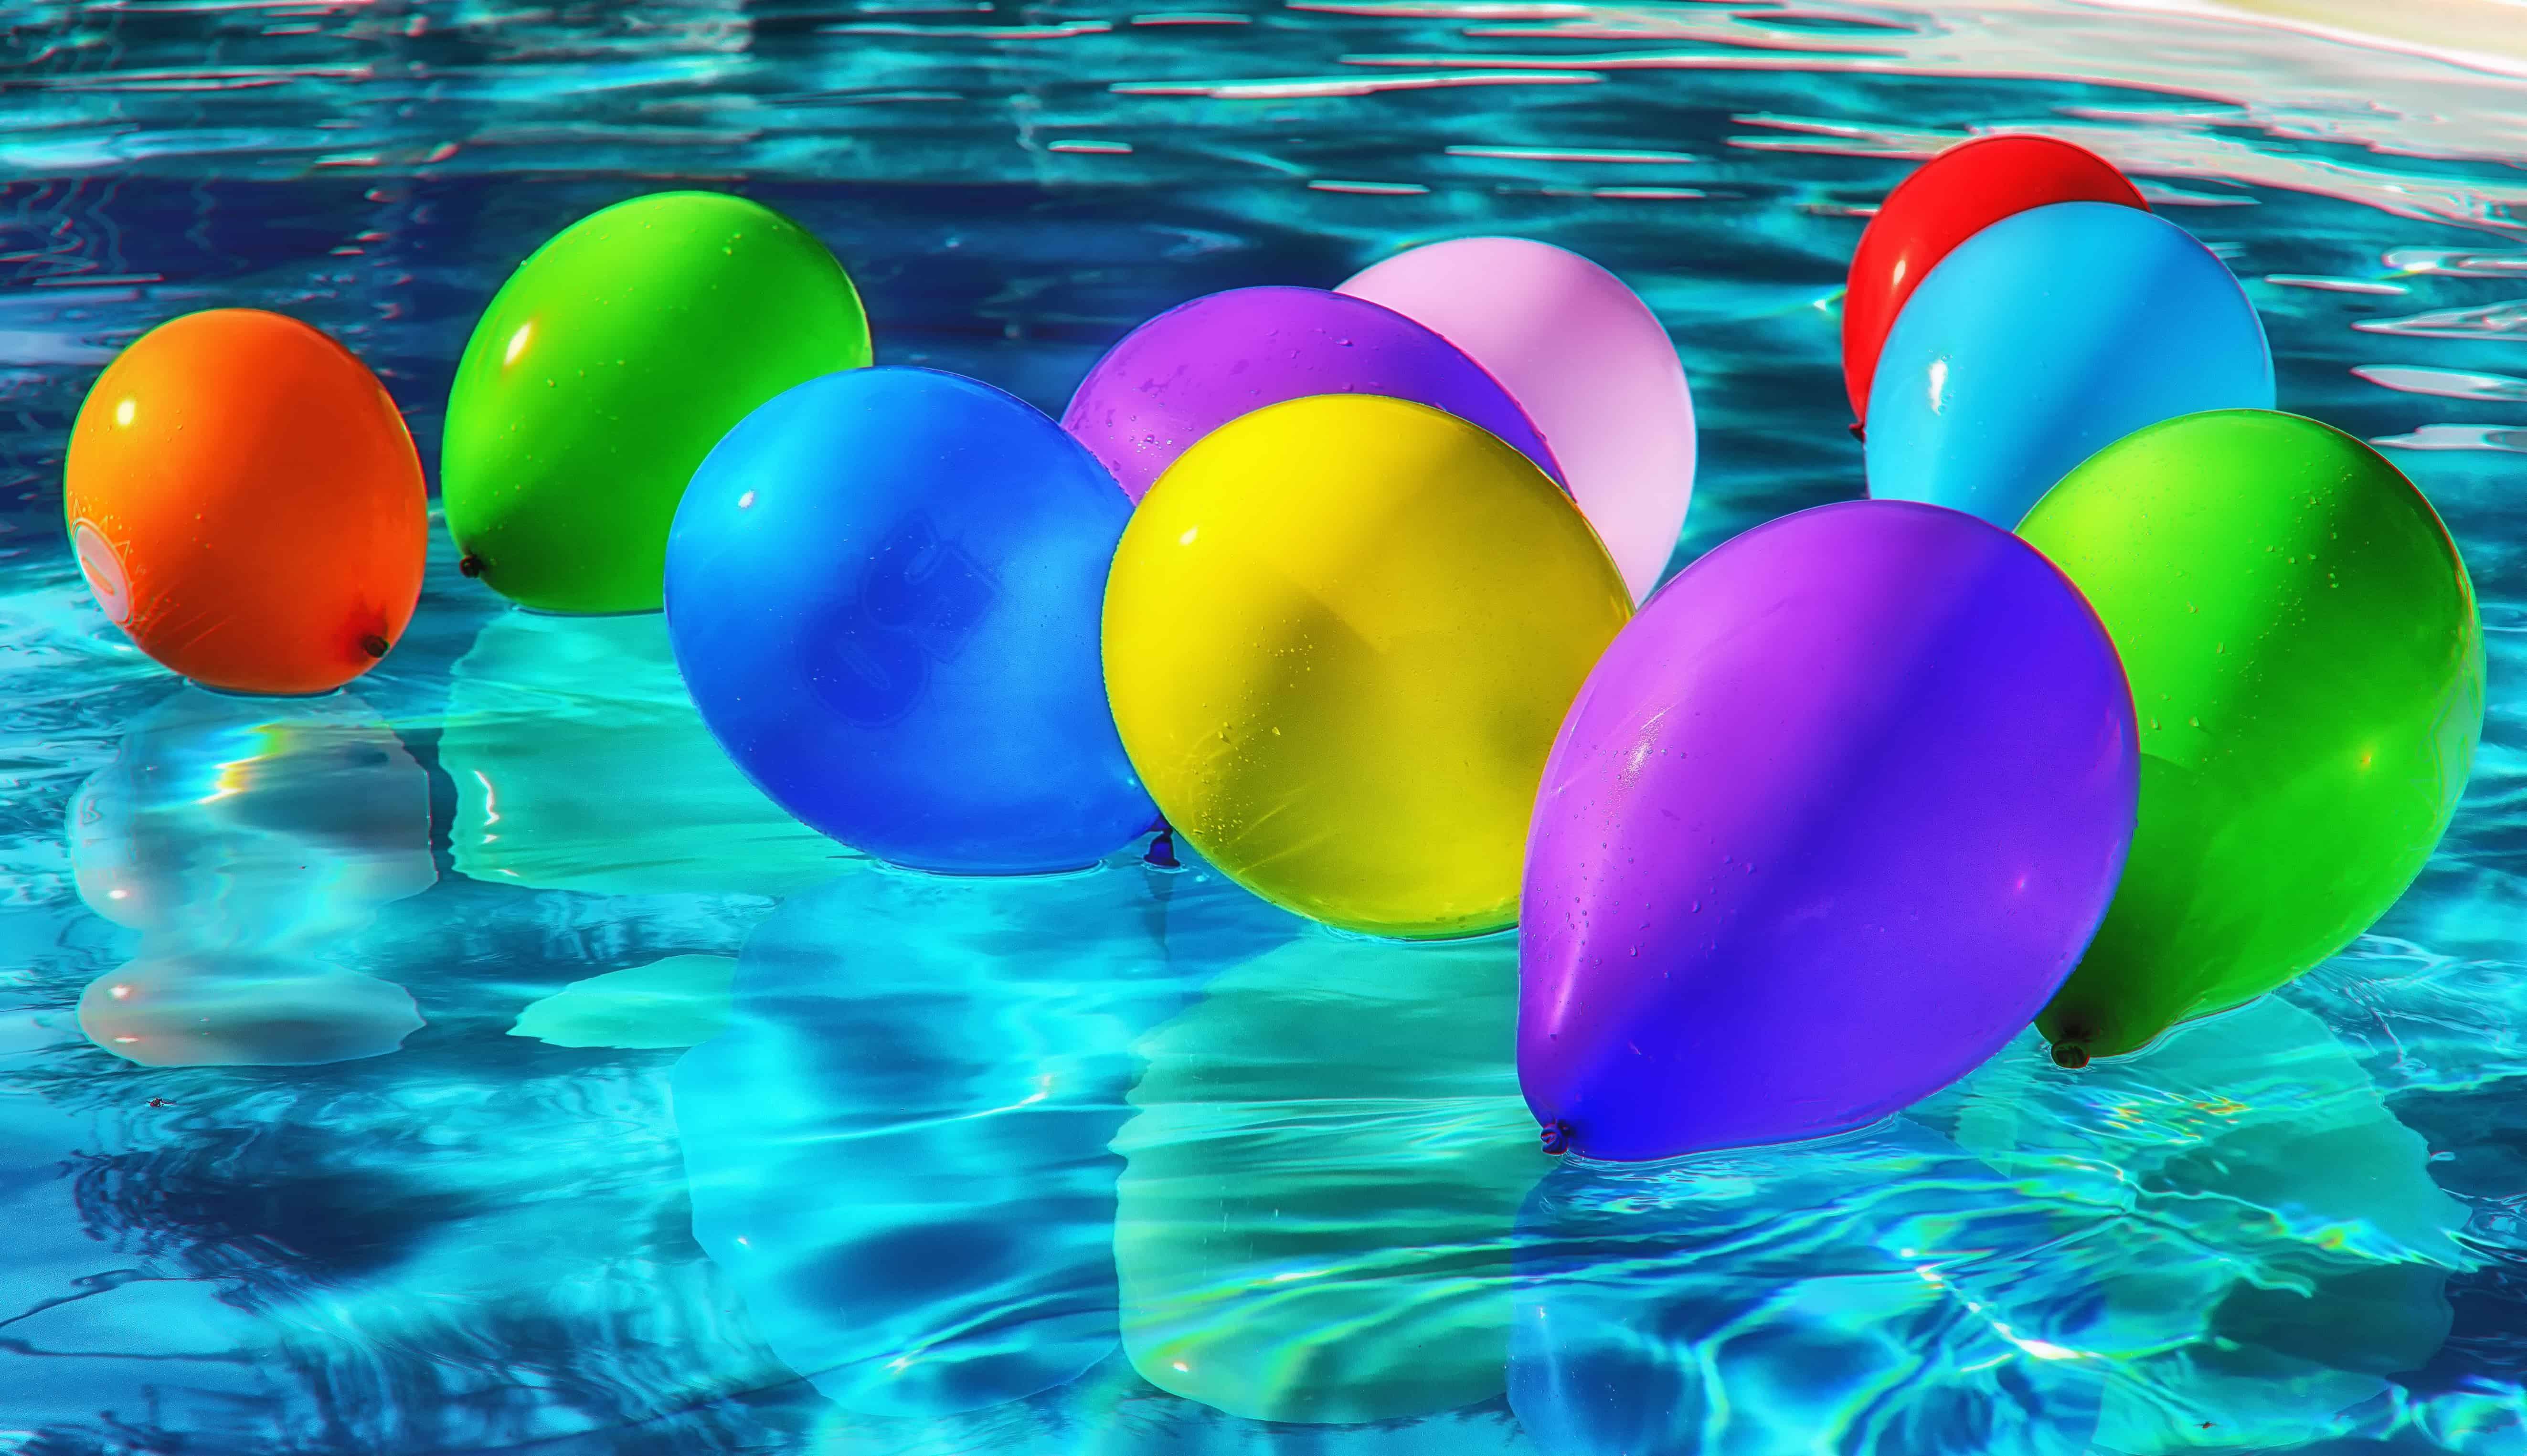 Birthday Background Wallpaper Hd Image Libre Piscine Color 233 Ballon Eau R 233 Flexion 233 T 233